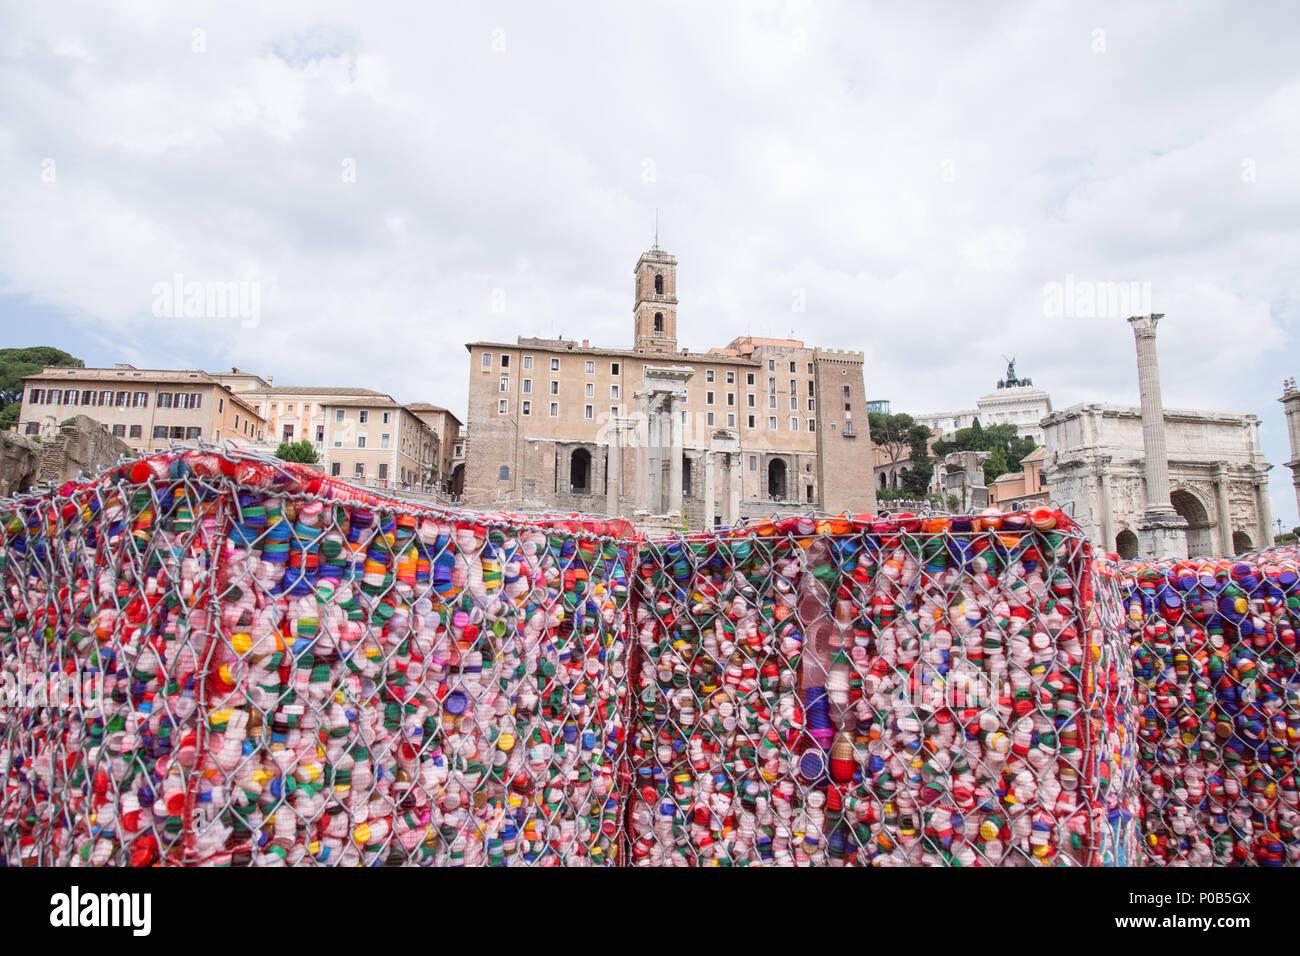 Rome, Italy  08th June, 2018  Artistic installation